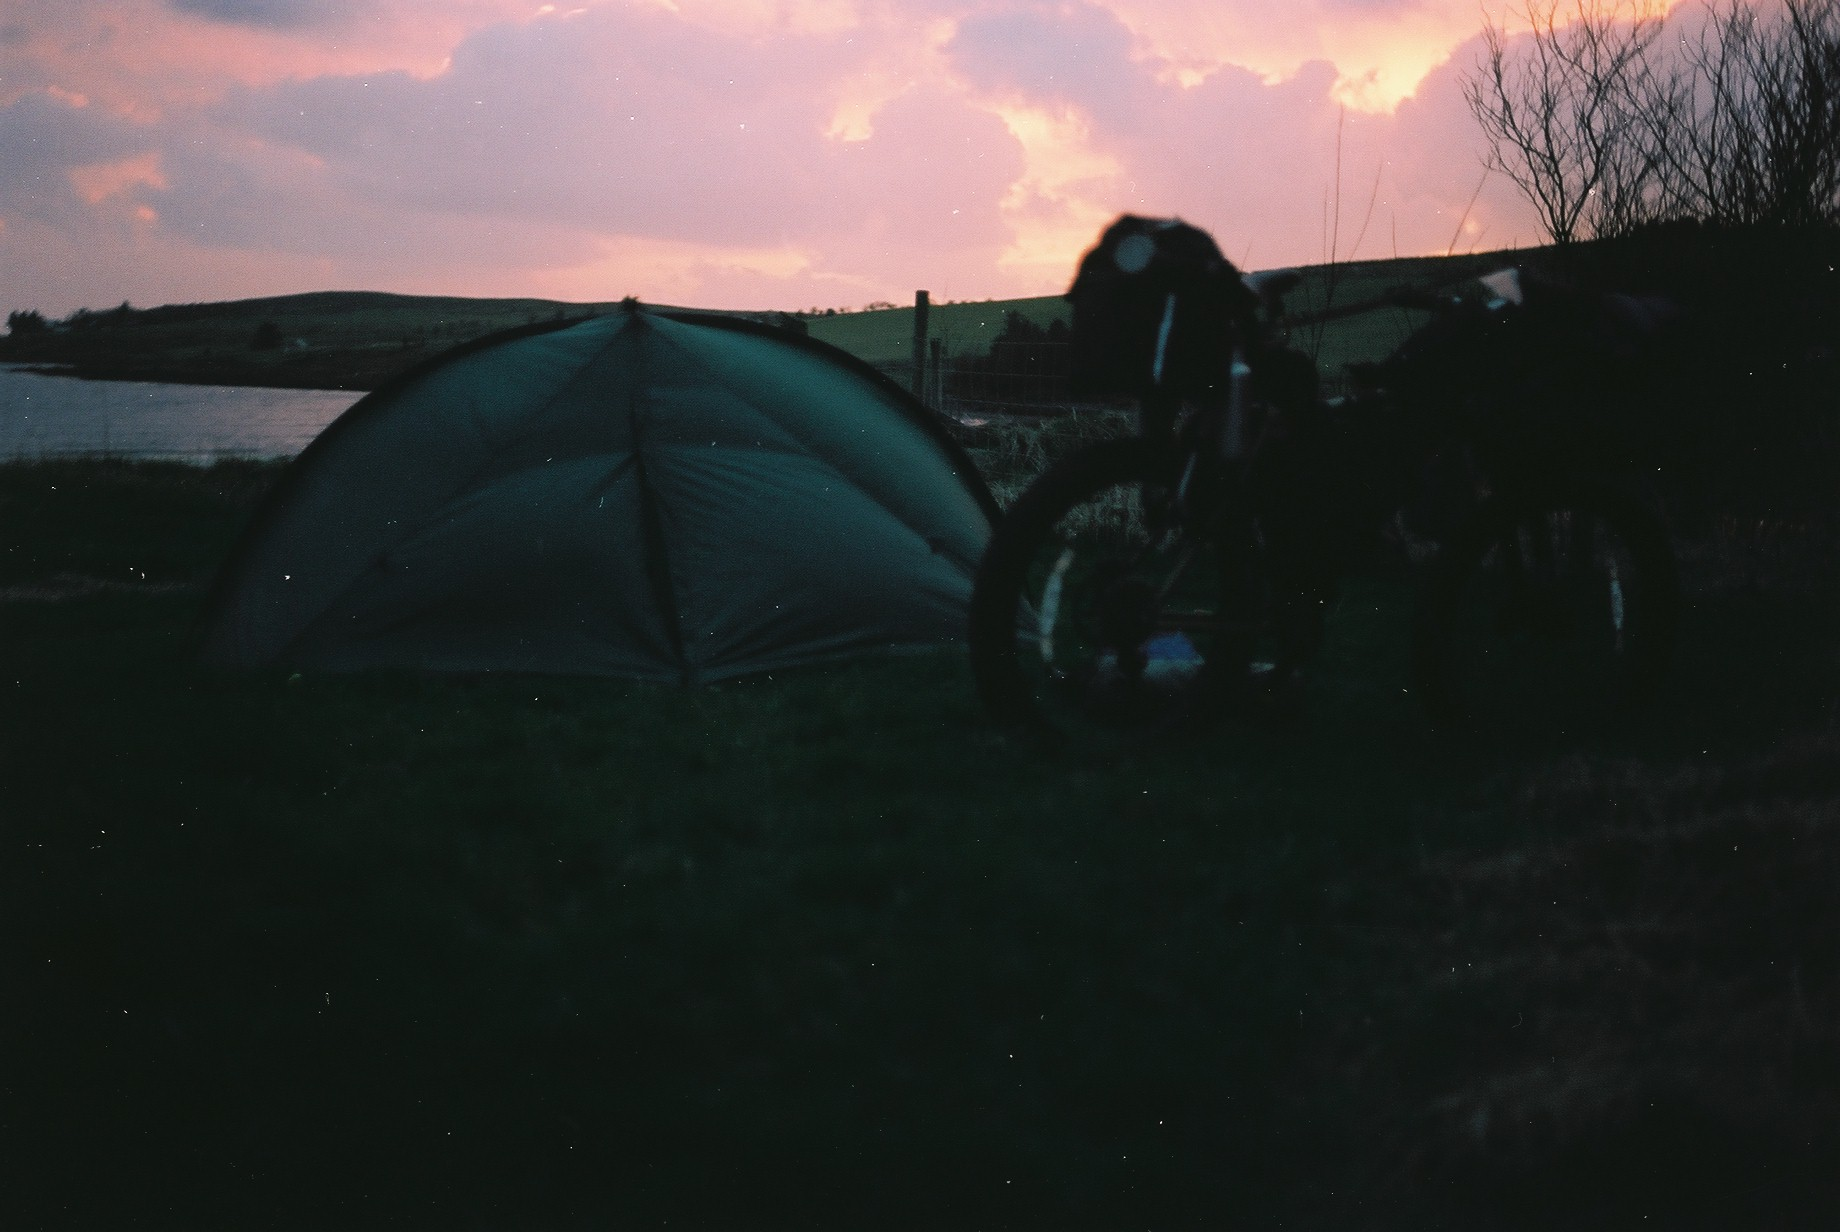 film is not dead, canon, canon ae1, ae1, kodak, kodak film, kodak portra, portra 160, analog photography, film photography, jack macgowan, bikepacking, bikepacking blog, cycling blog, travel photography, travel blog, skye, isle of skye, scottish highlands, bikepacking scotland, bicycle touring apocalypse, landscape photography, mountains, hiking